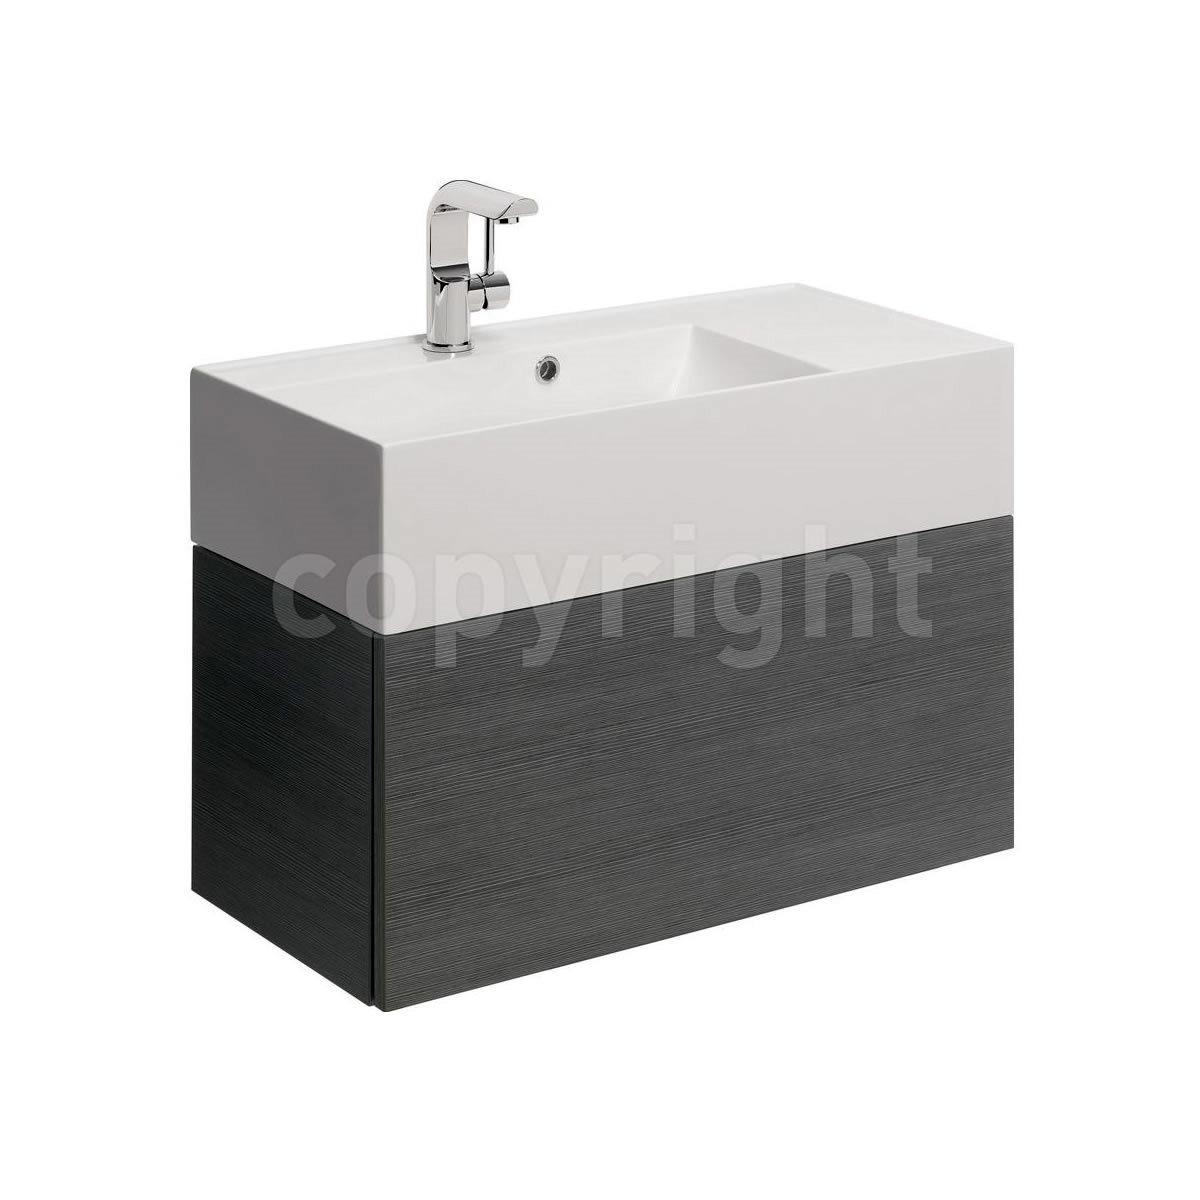 Innovative Bathroom Furniture Range From Crosswater Httpwwwbauhausbathrooms